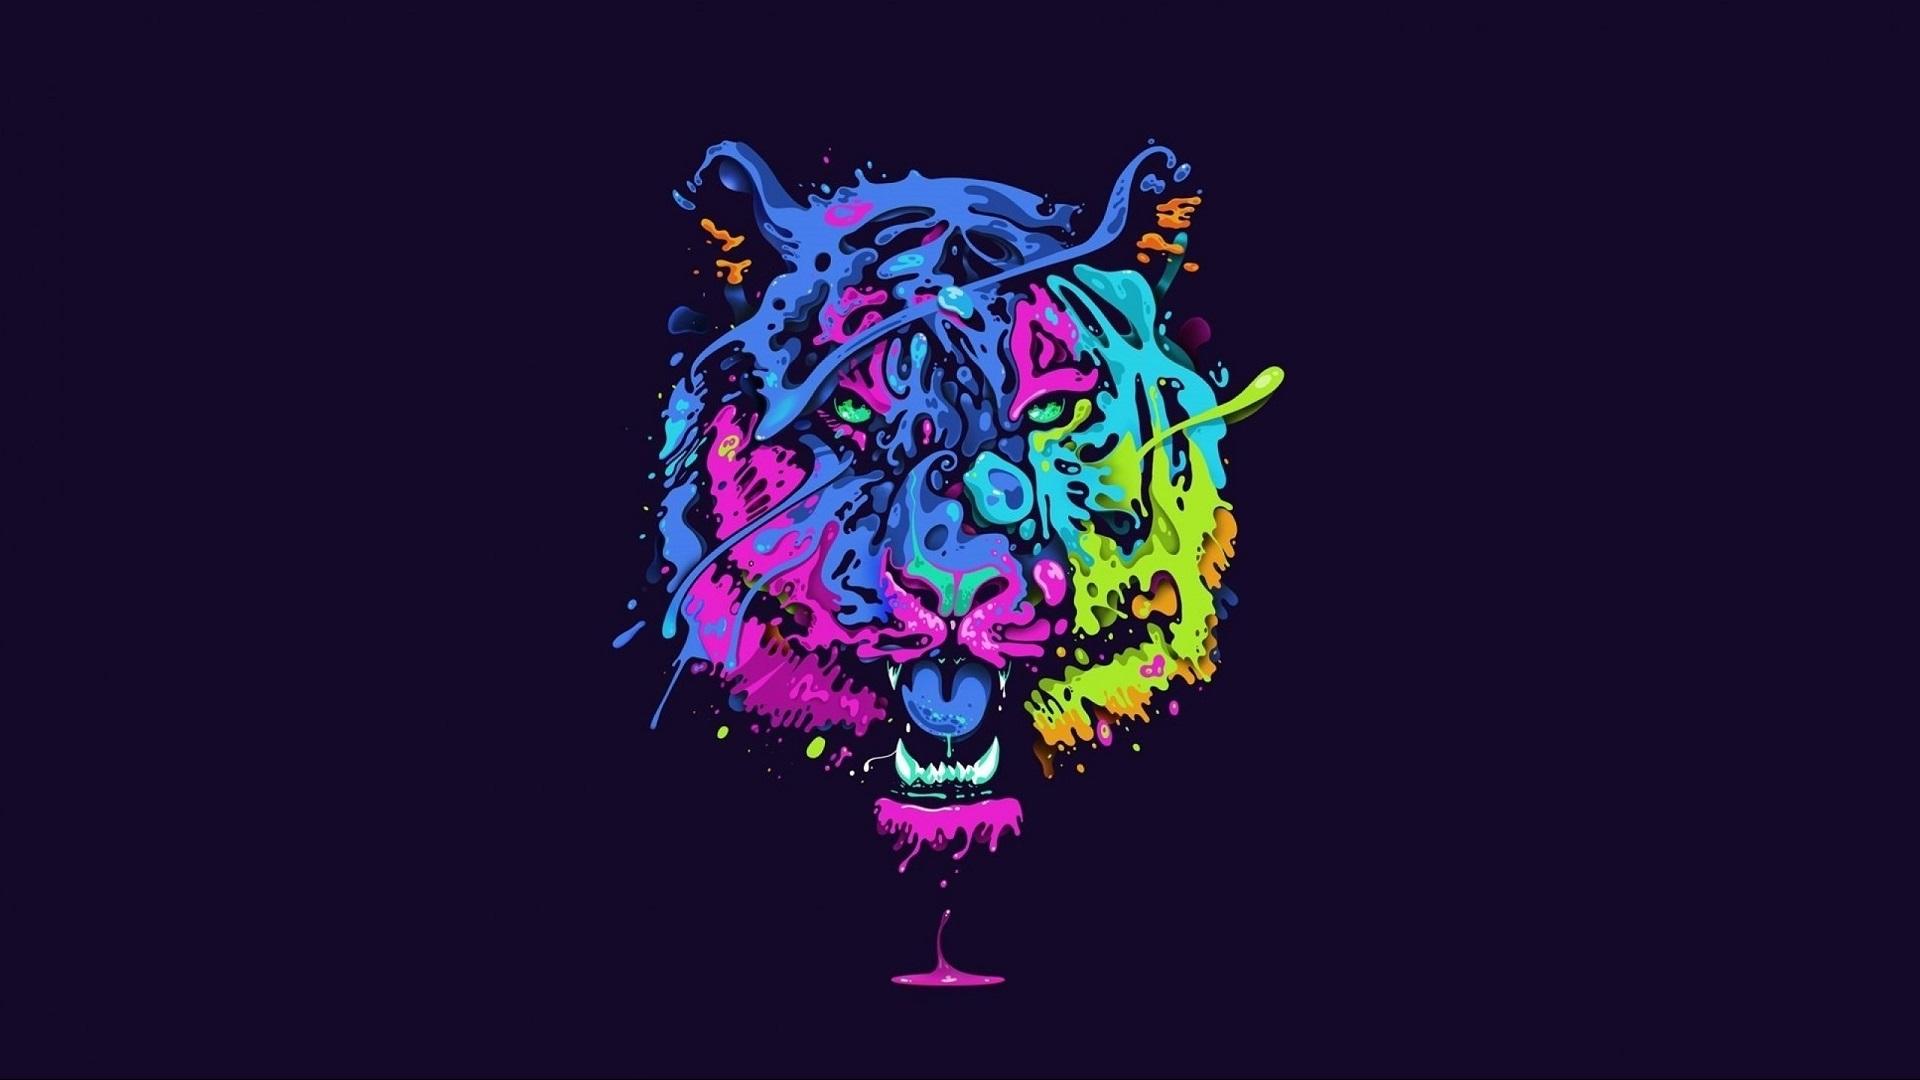 General 1920x1080 tiger animals big cats artwork colorful neon